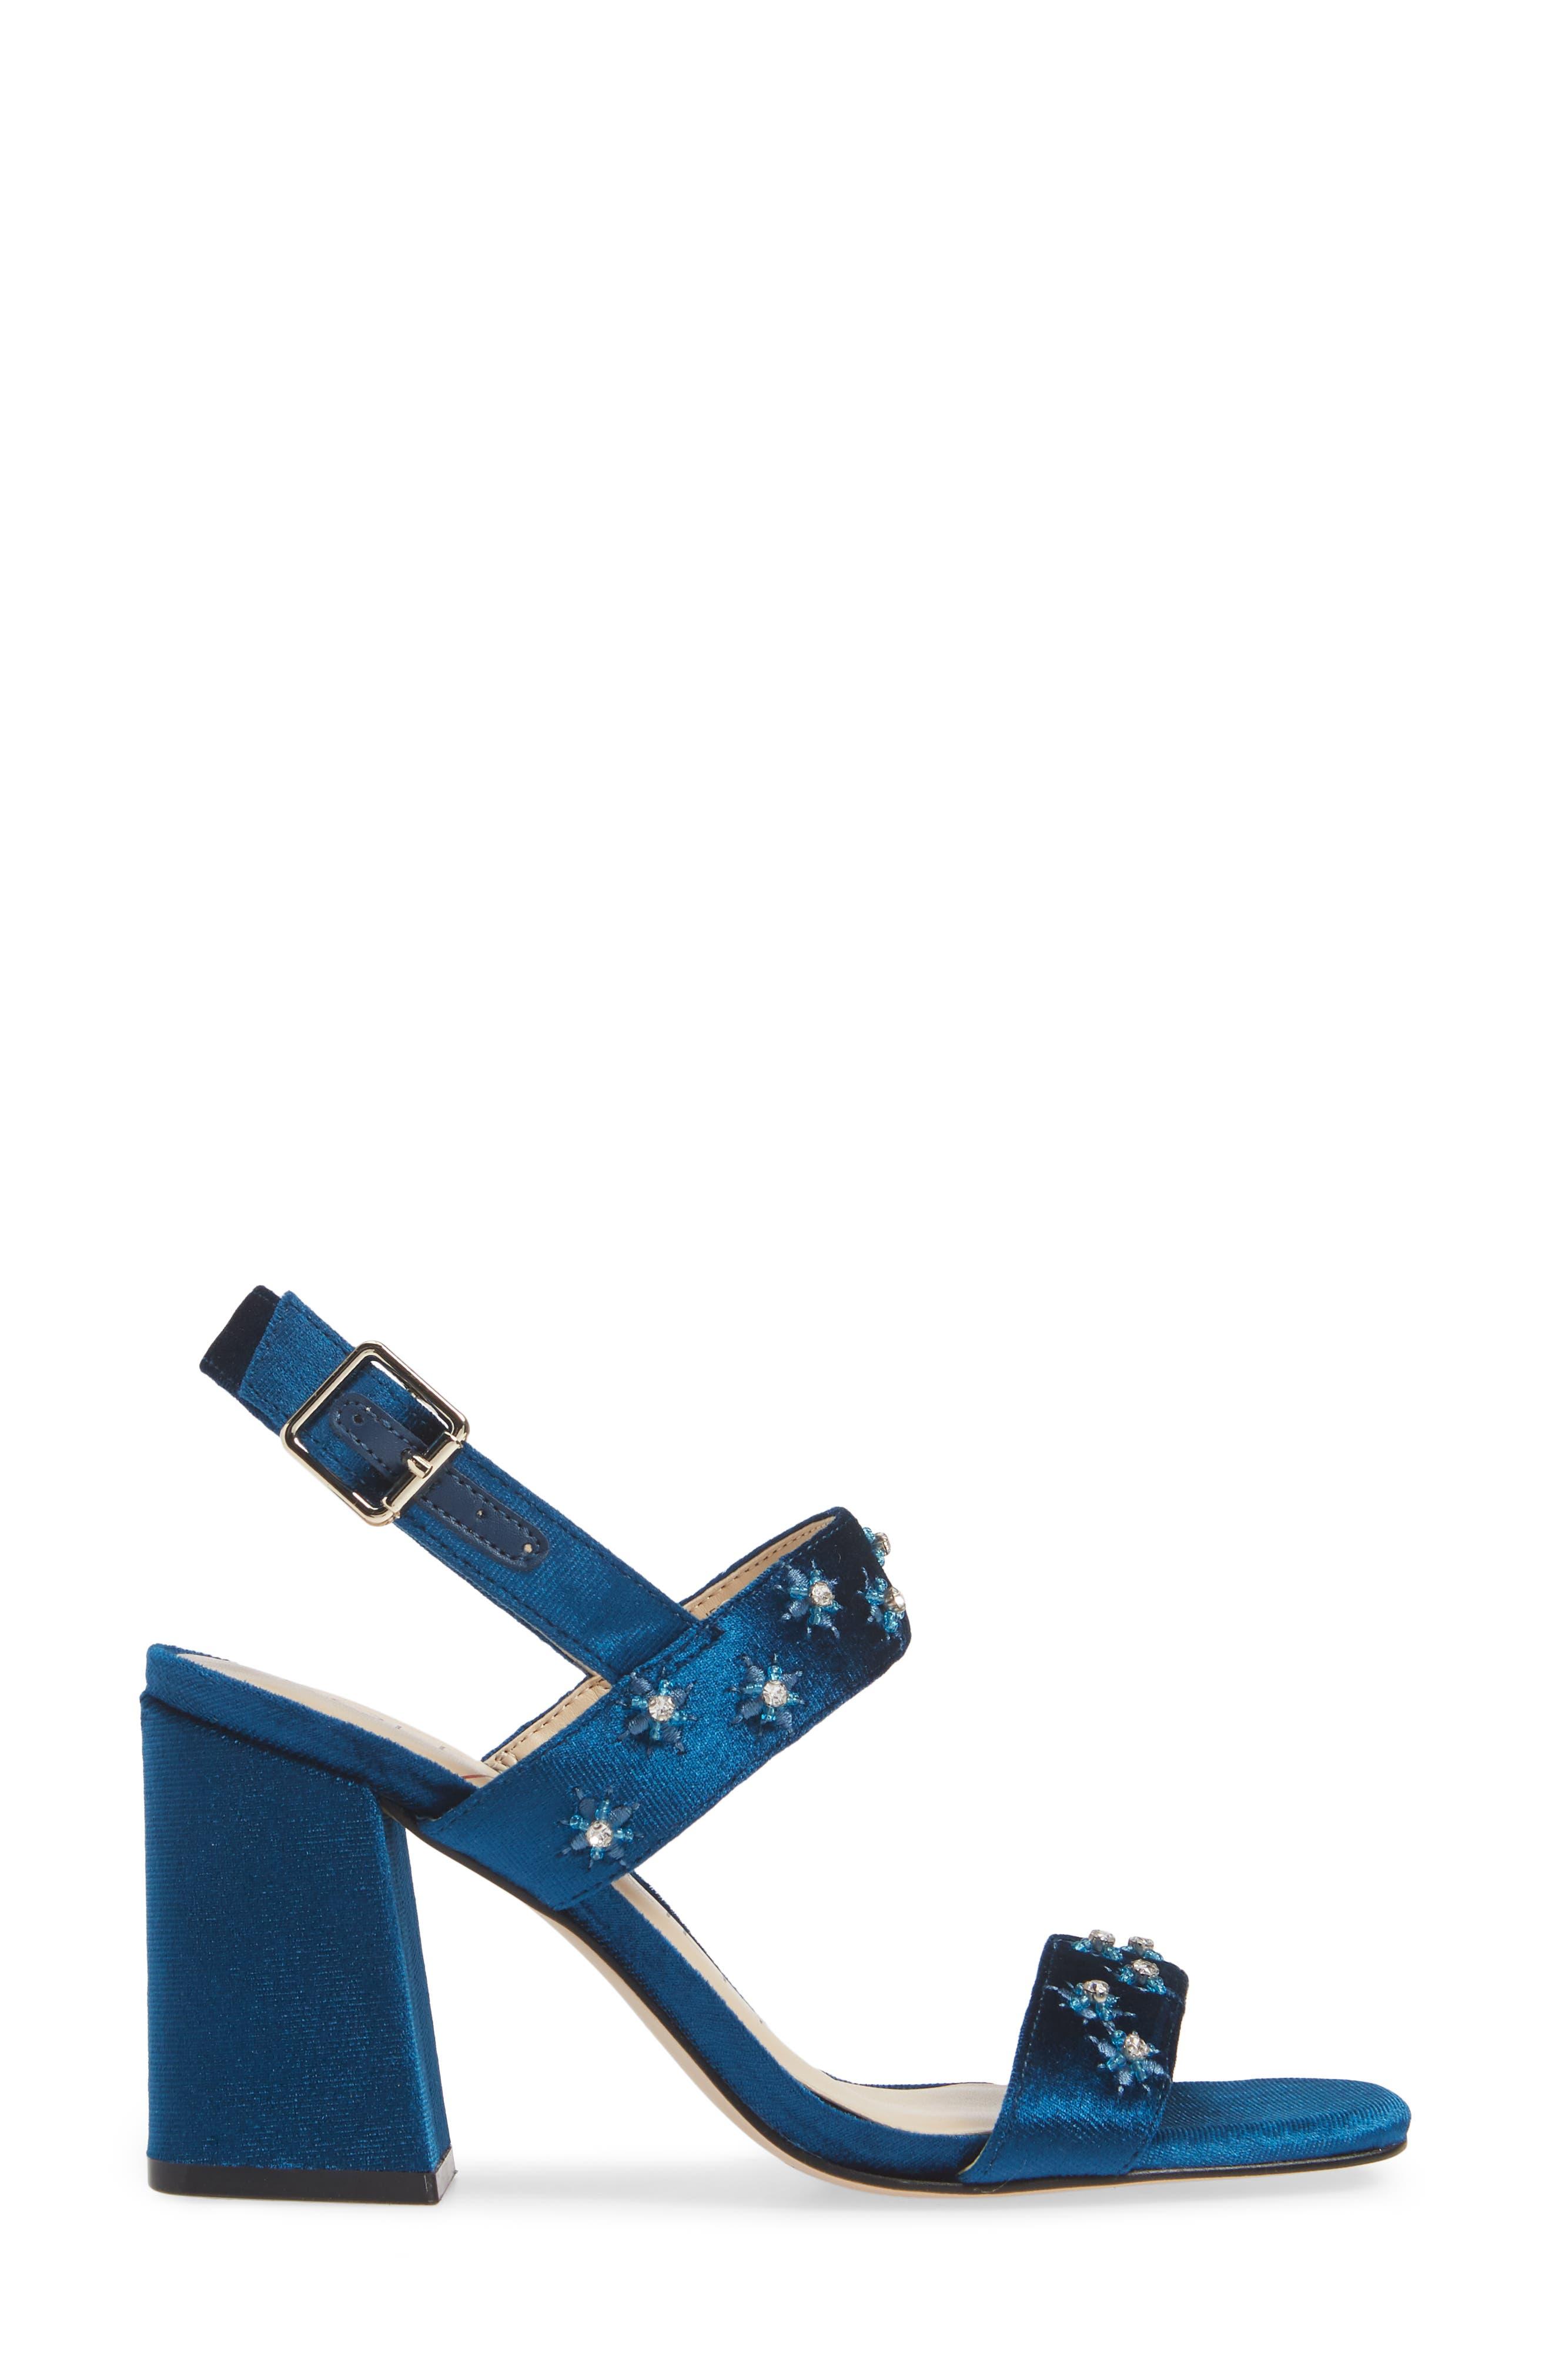 SOLE SOCIETY, Jessibel Sandal, Alternate thumbnail 3, color, CERULEAN BLUE VELVET